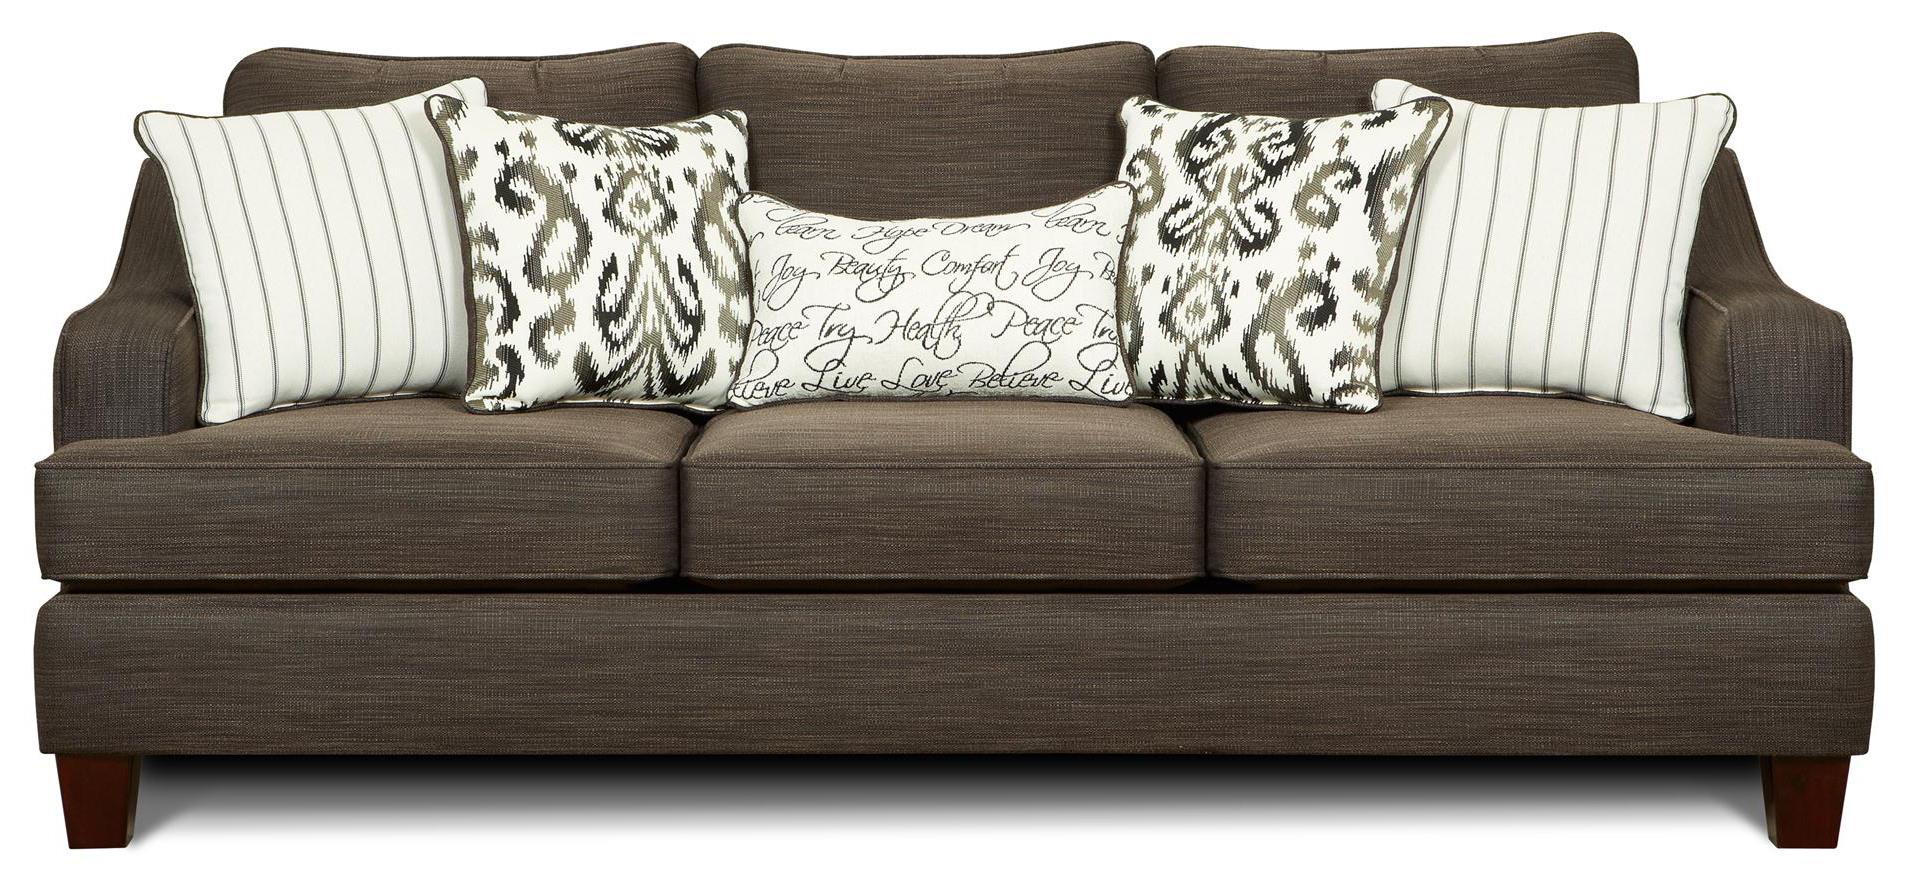 VFM Signature 2310 Sofa - Item Number: 2310-KP-OdinPewter